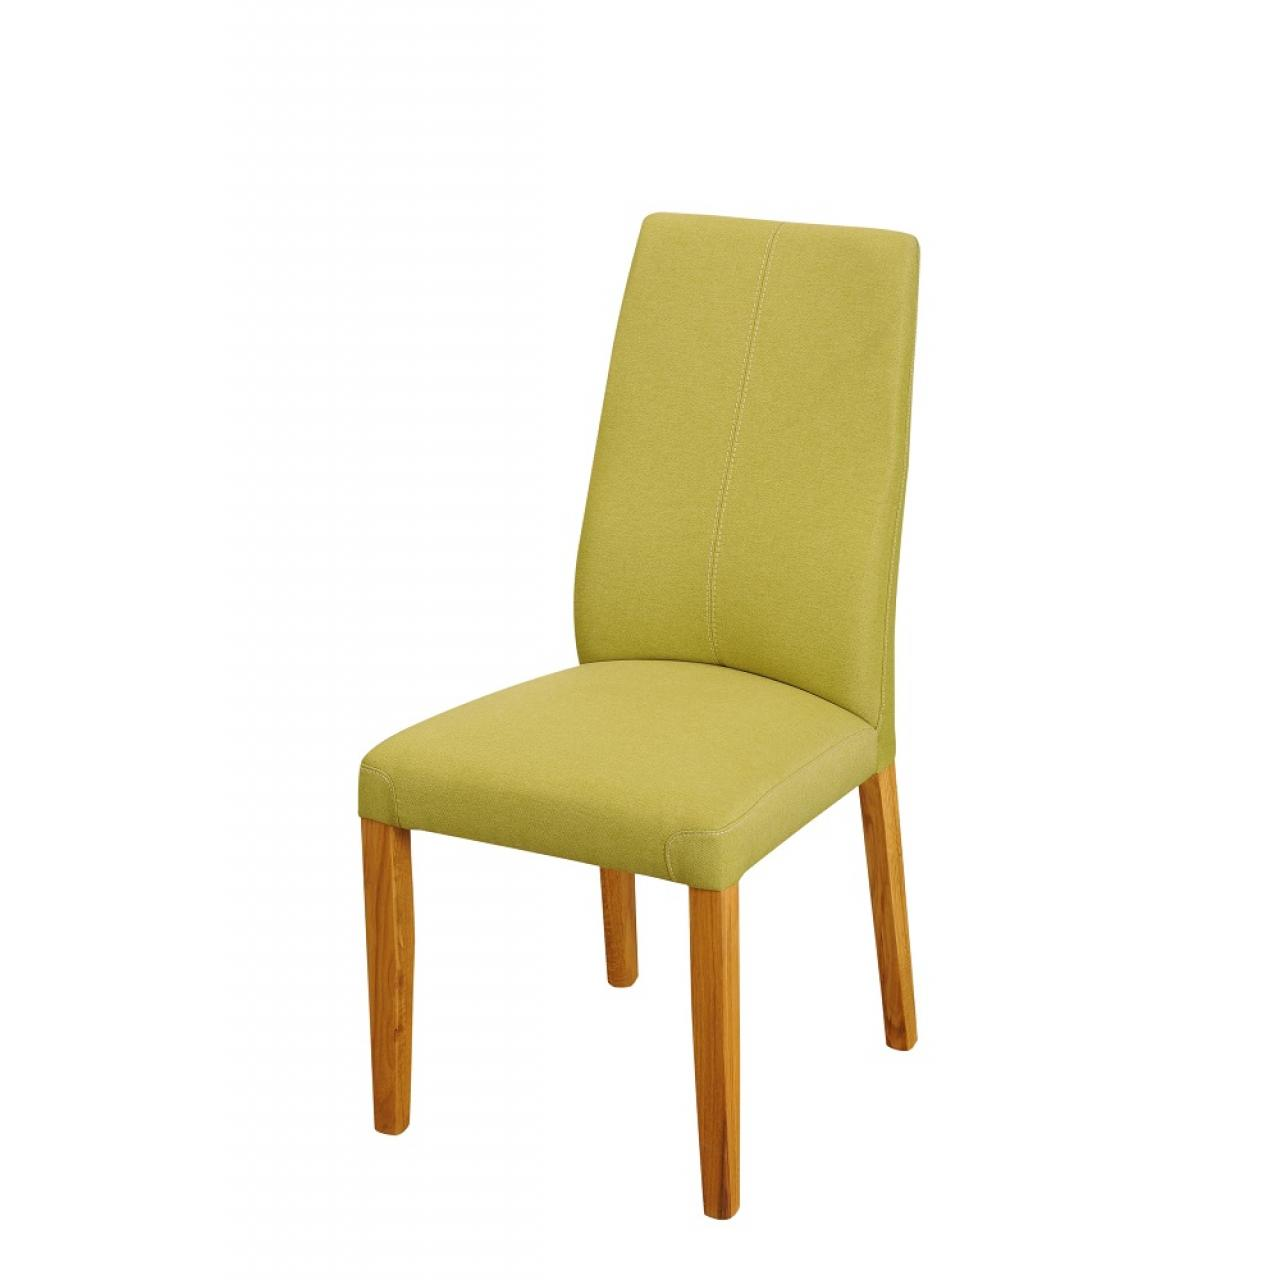 Stuhl 130 E6 Stoff Grün Natur Massivholz Stoff Esszimmerstuhl Küche